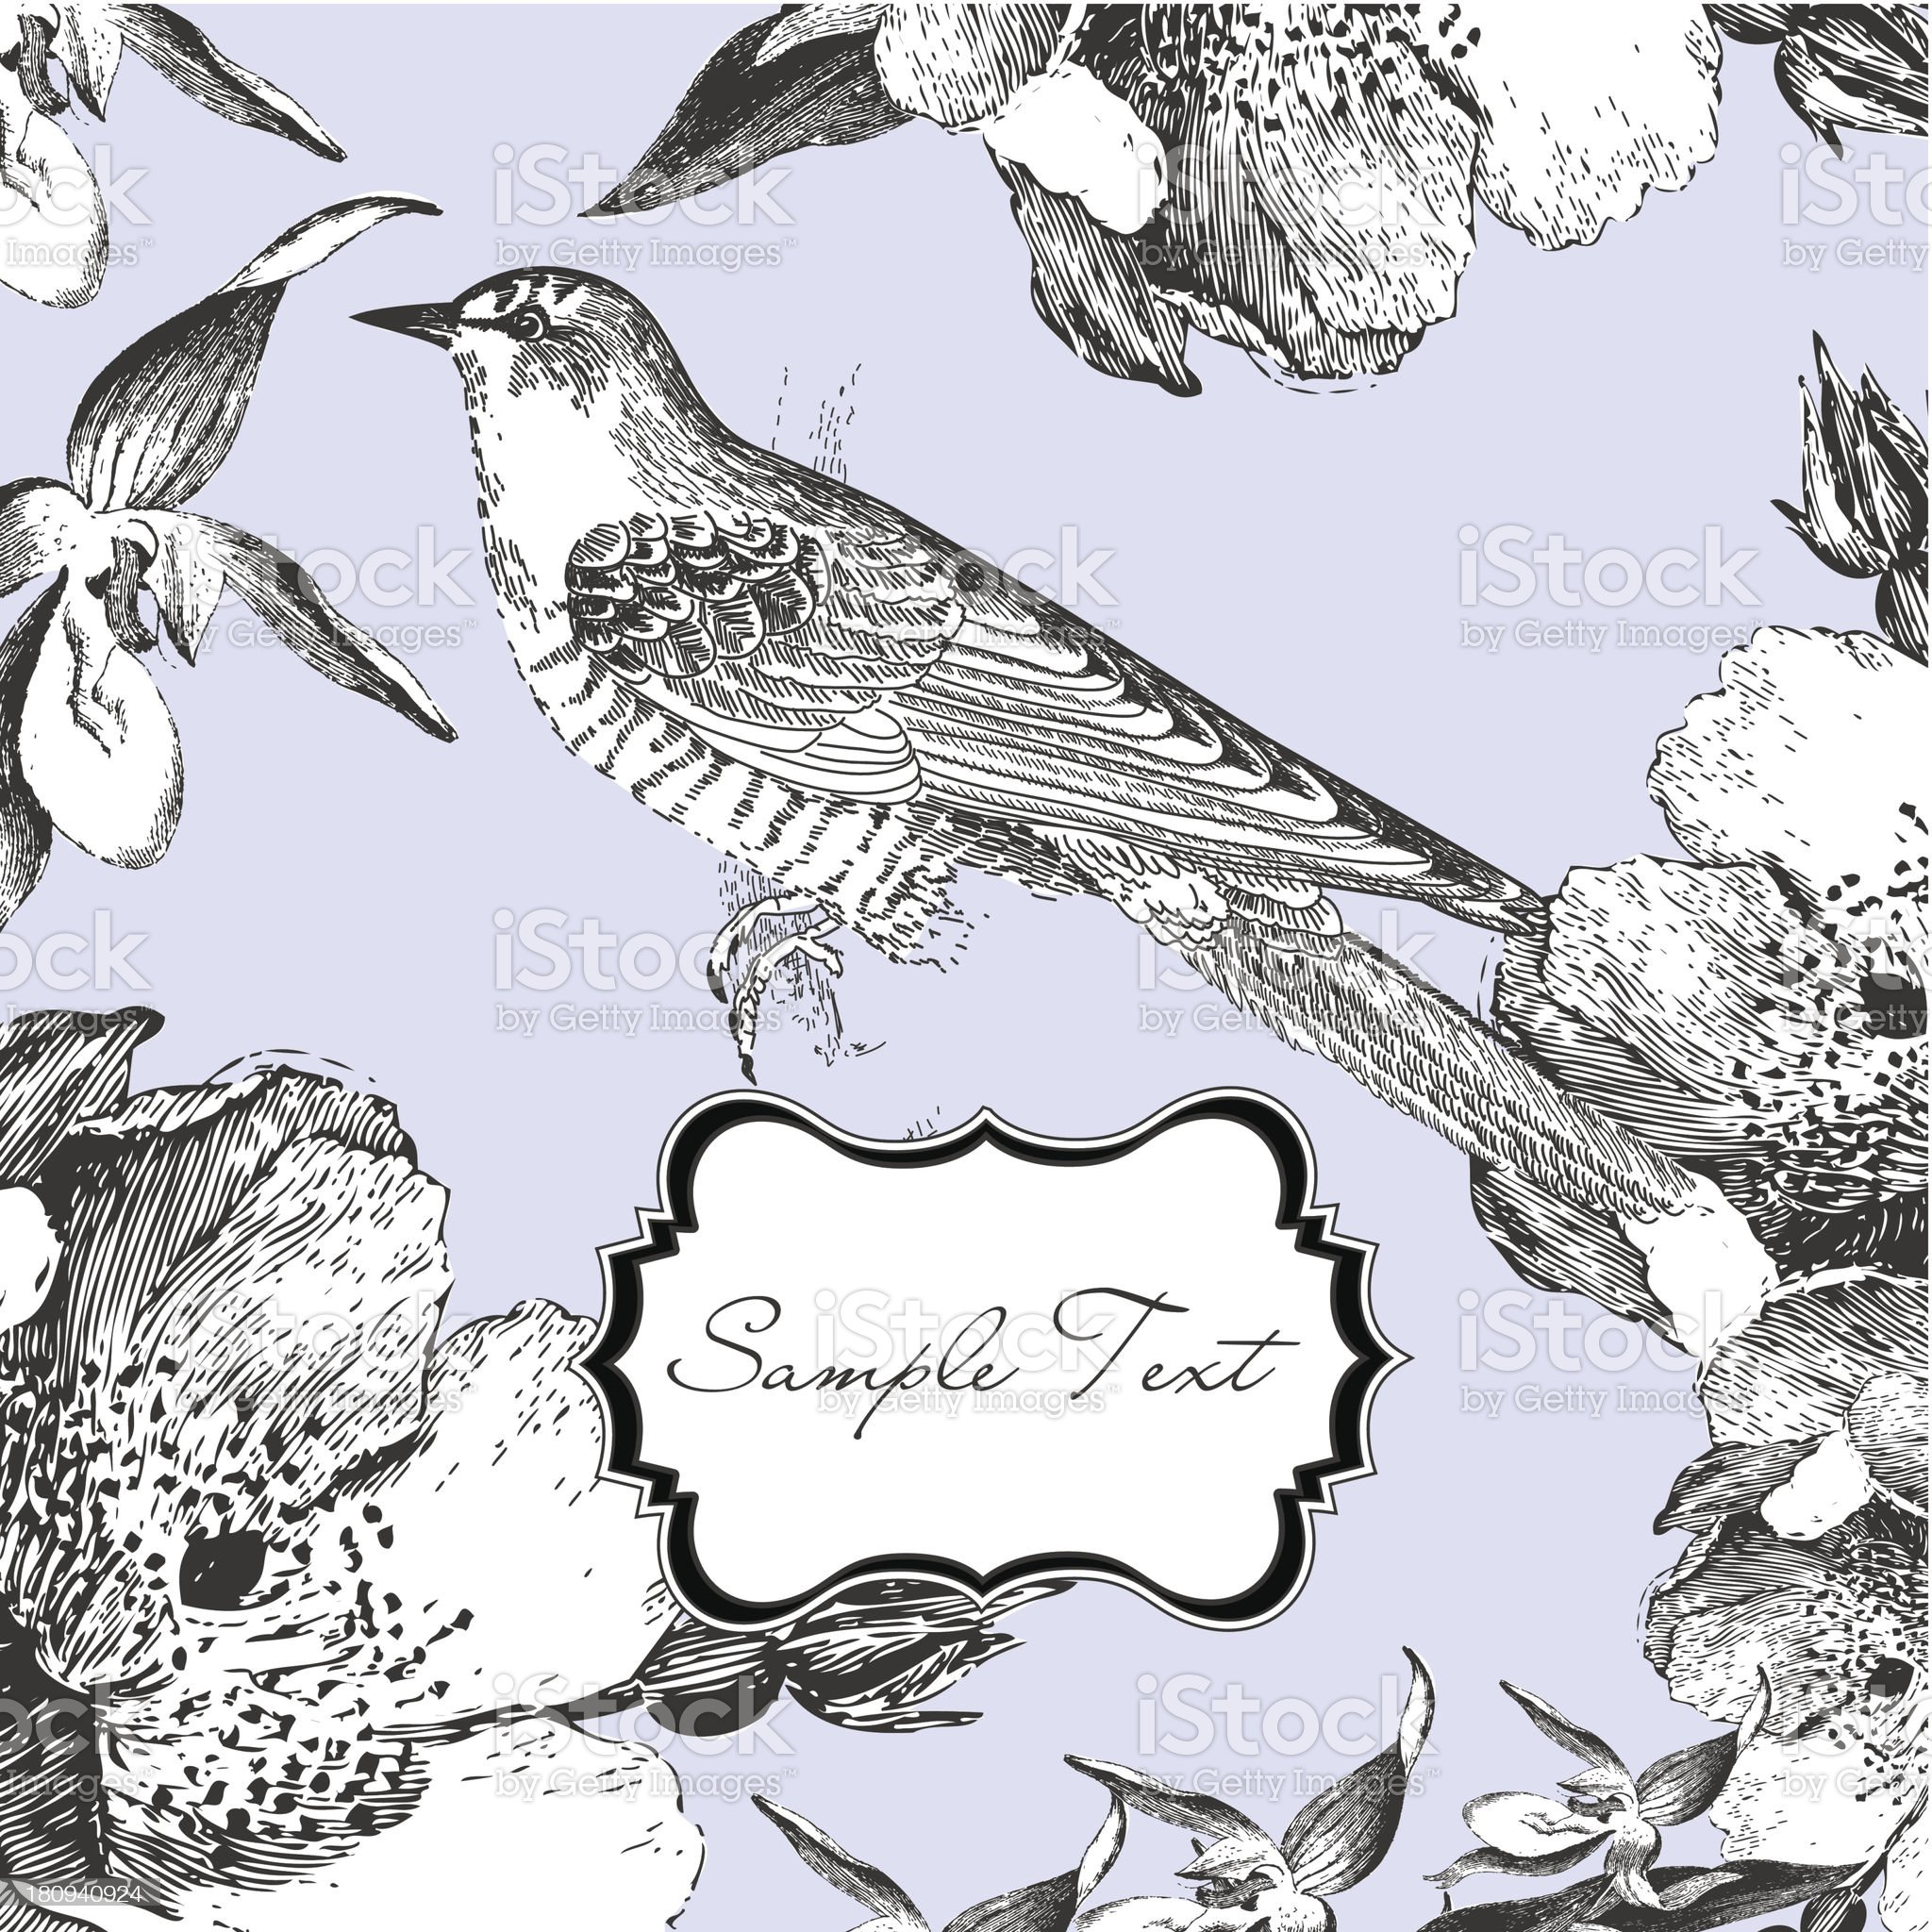 Retro Bird Illustration royalty-free stock vector art